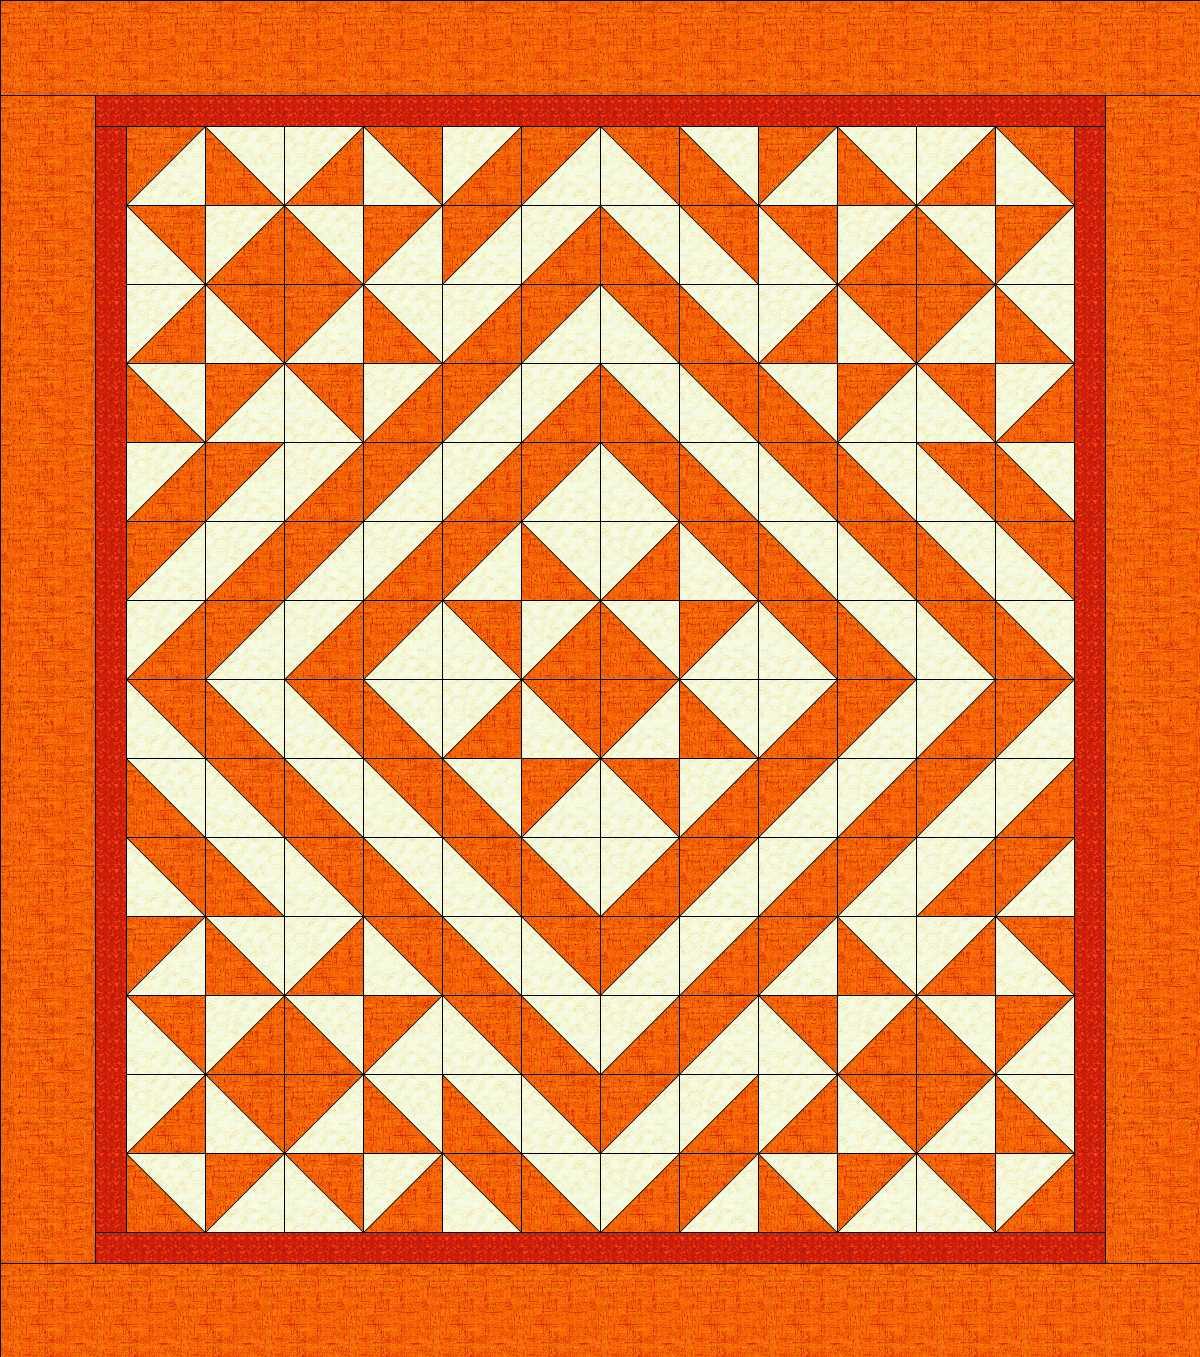 L Fair Quilts L Fair Quilt Patterns